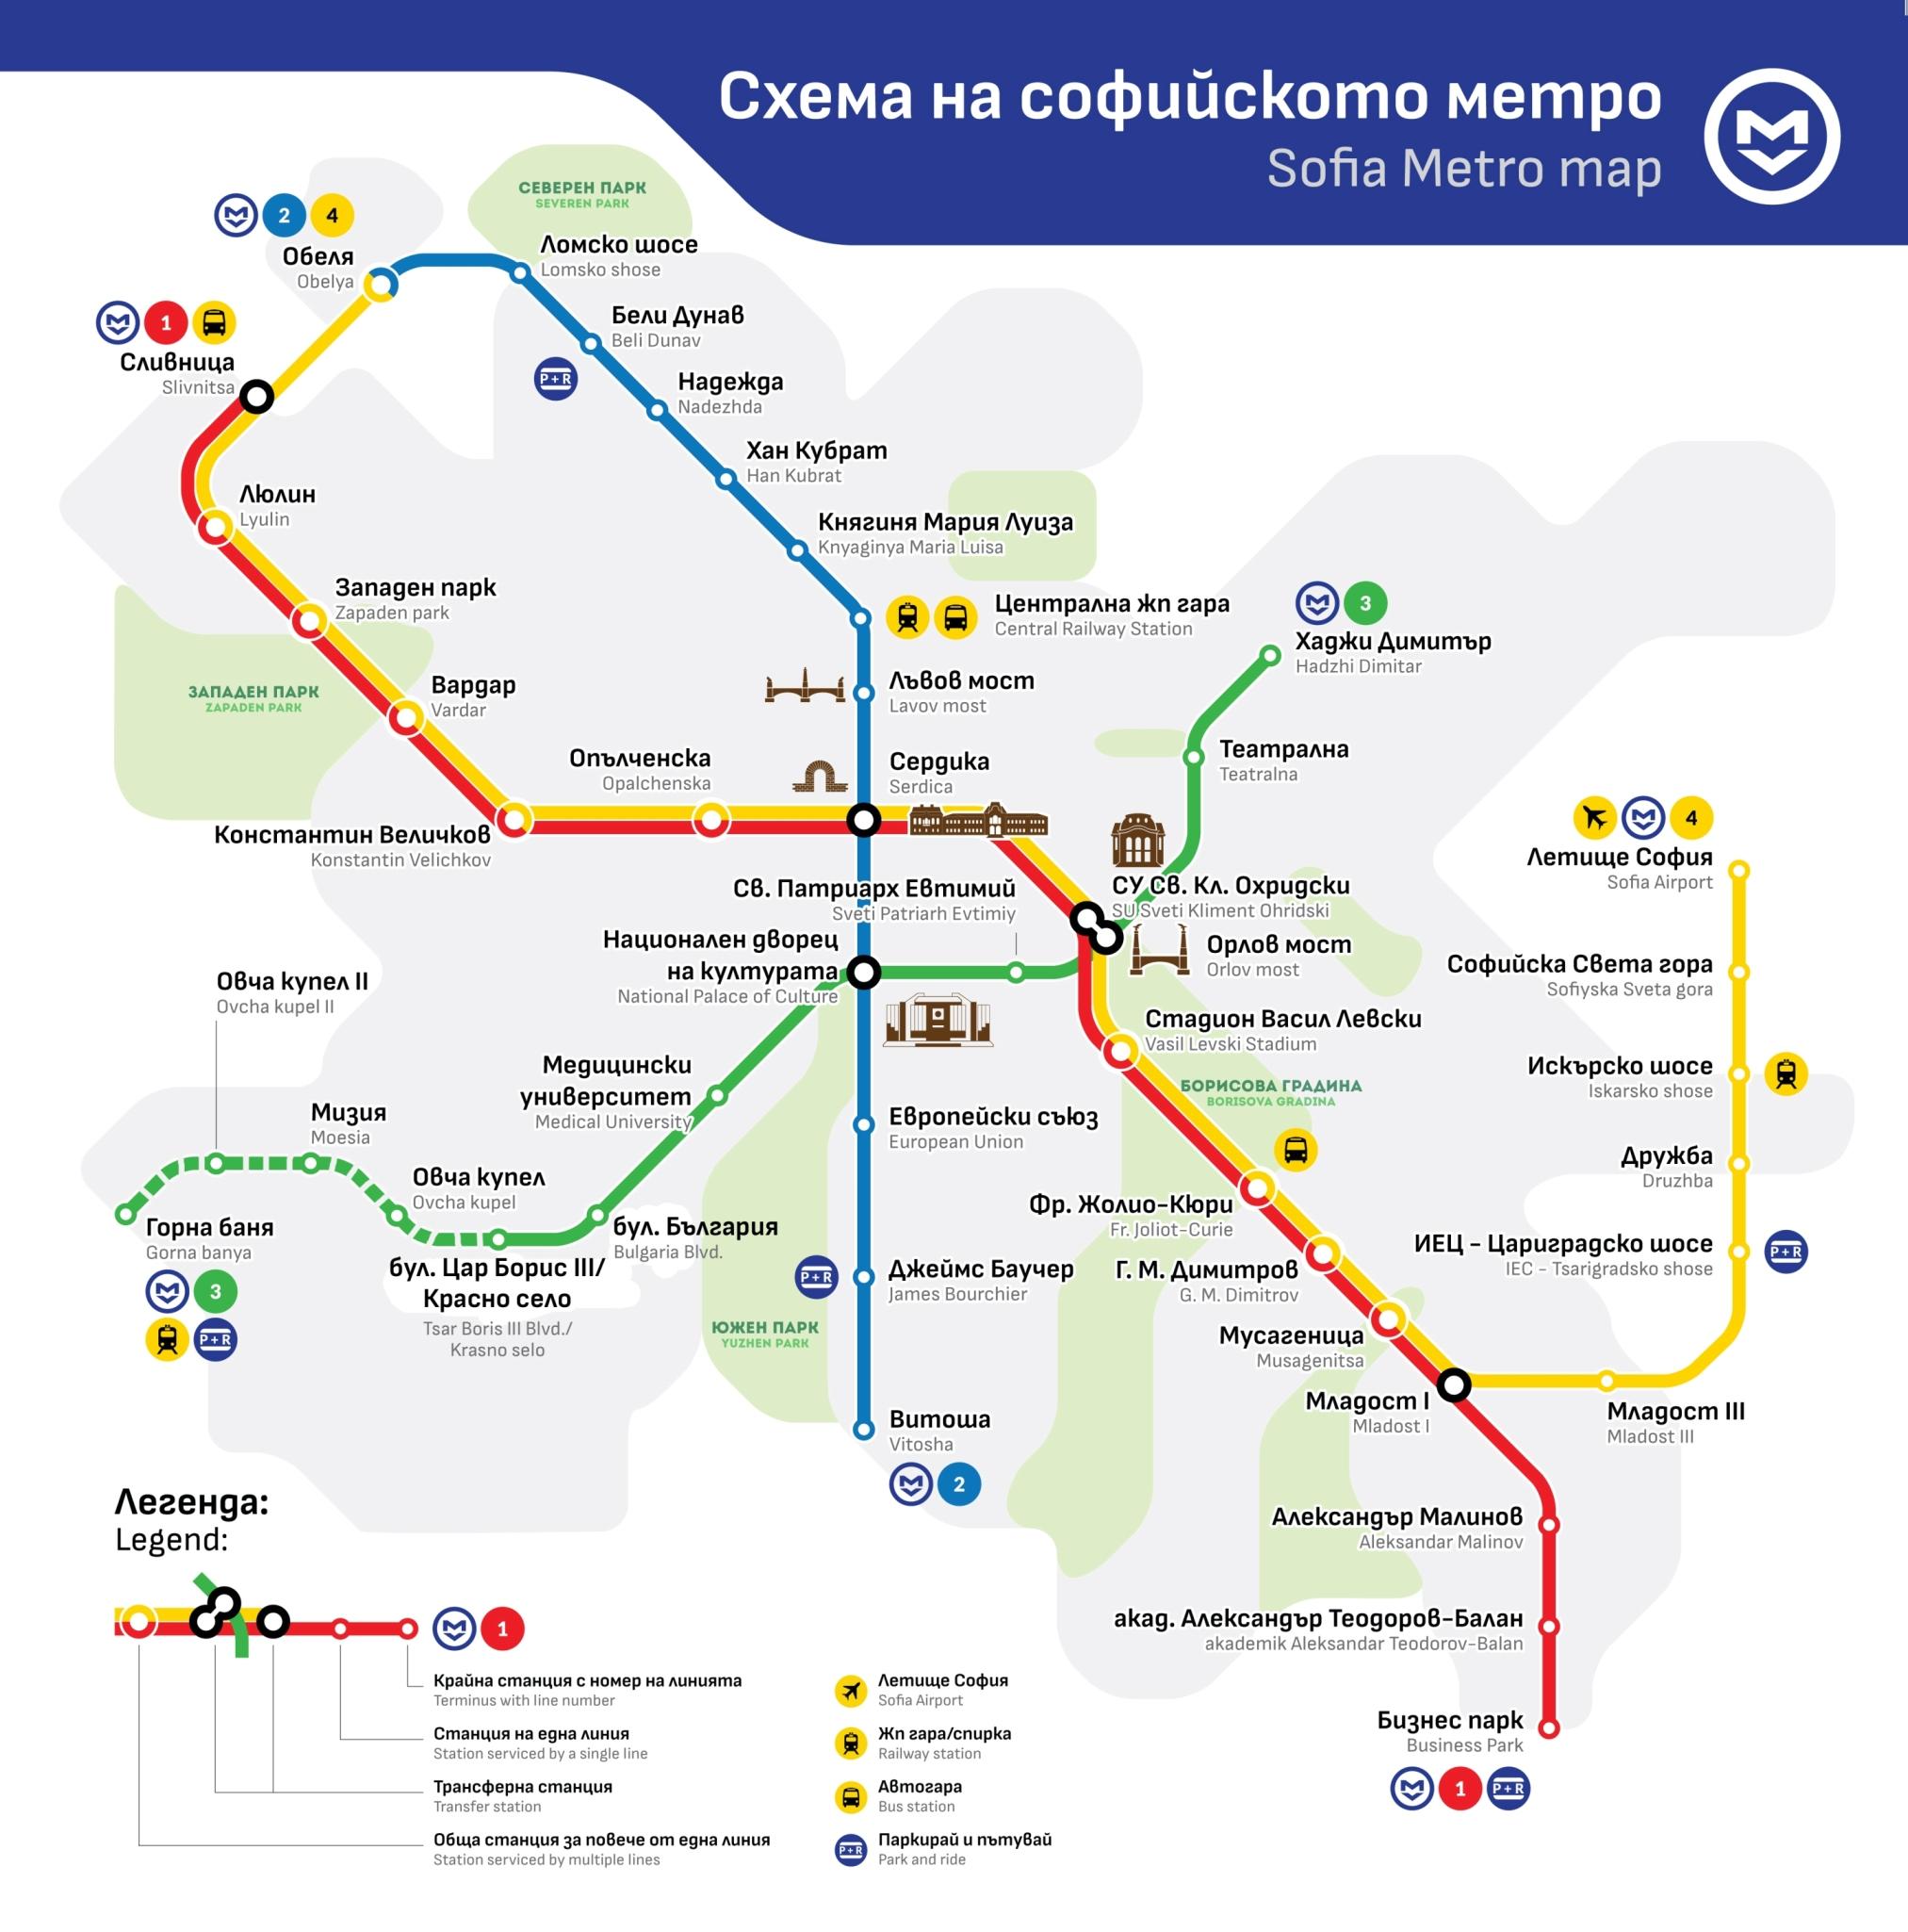 Sofia nimmt Metrolinie 3 in Betrieb